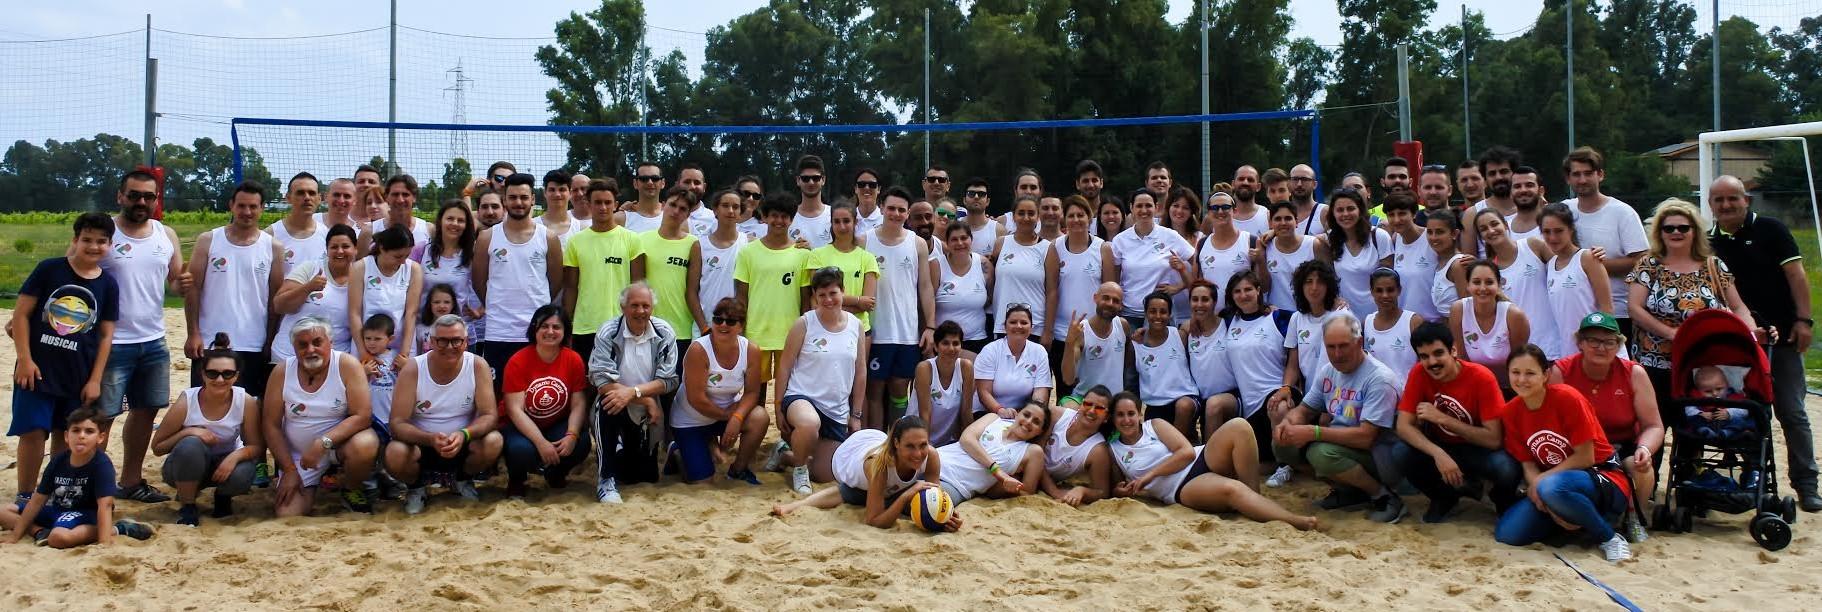 cuore-volley-latina